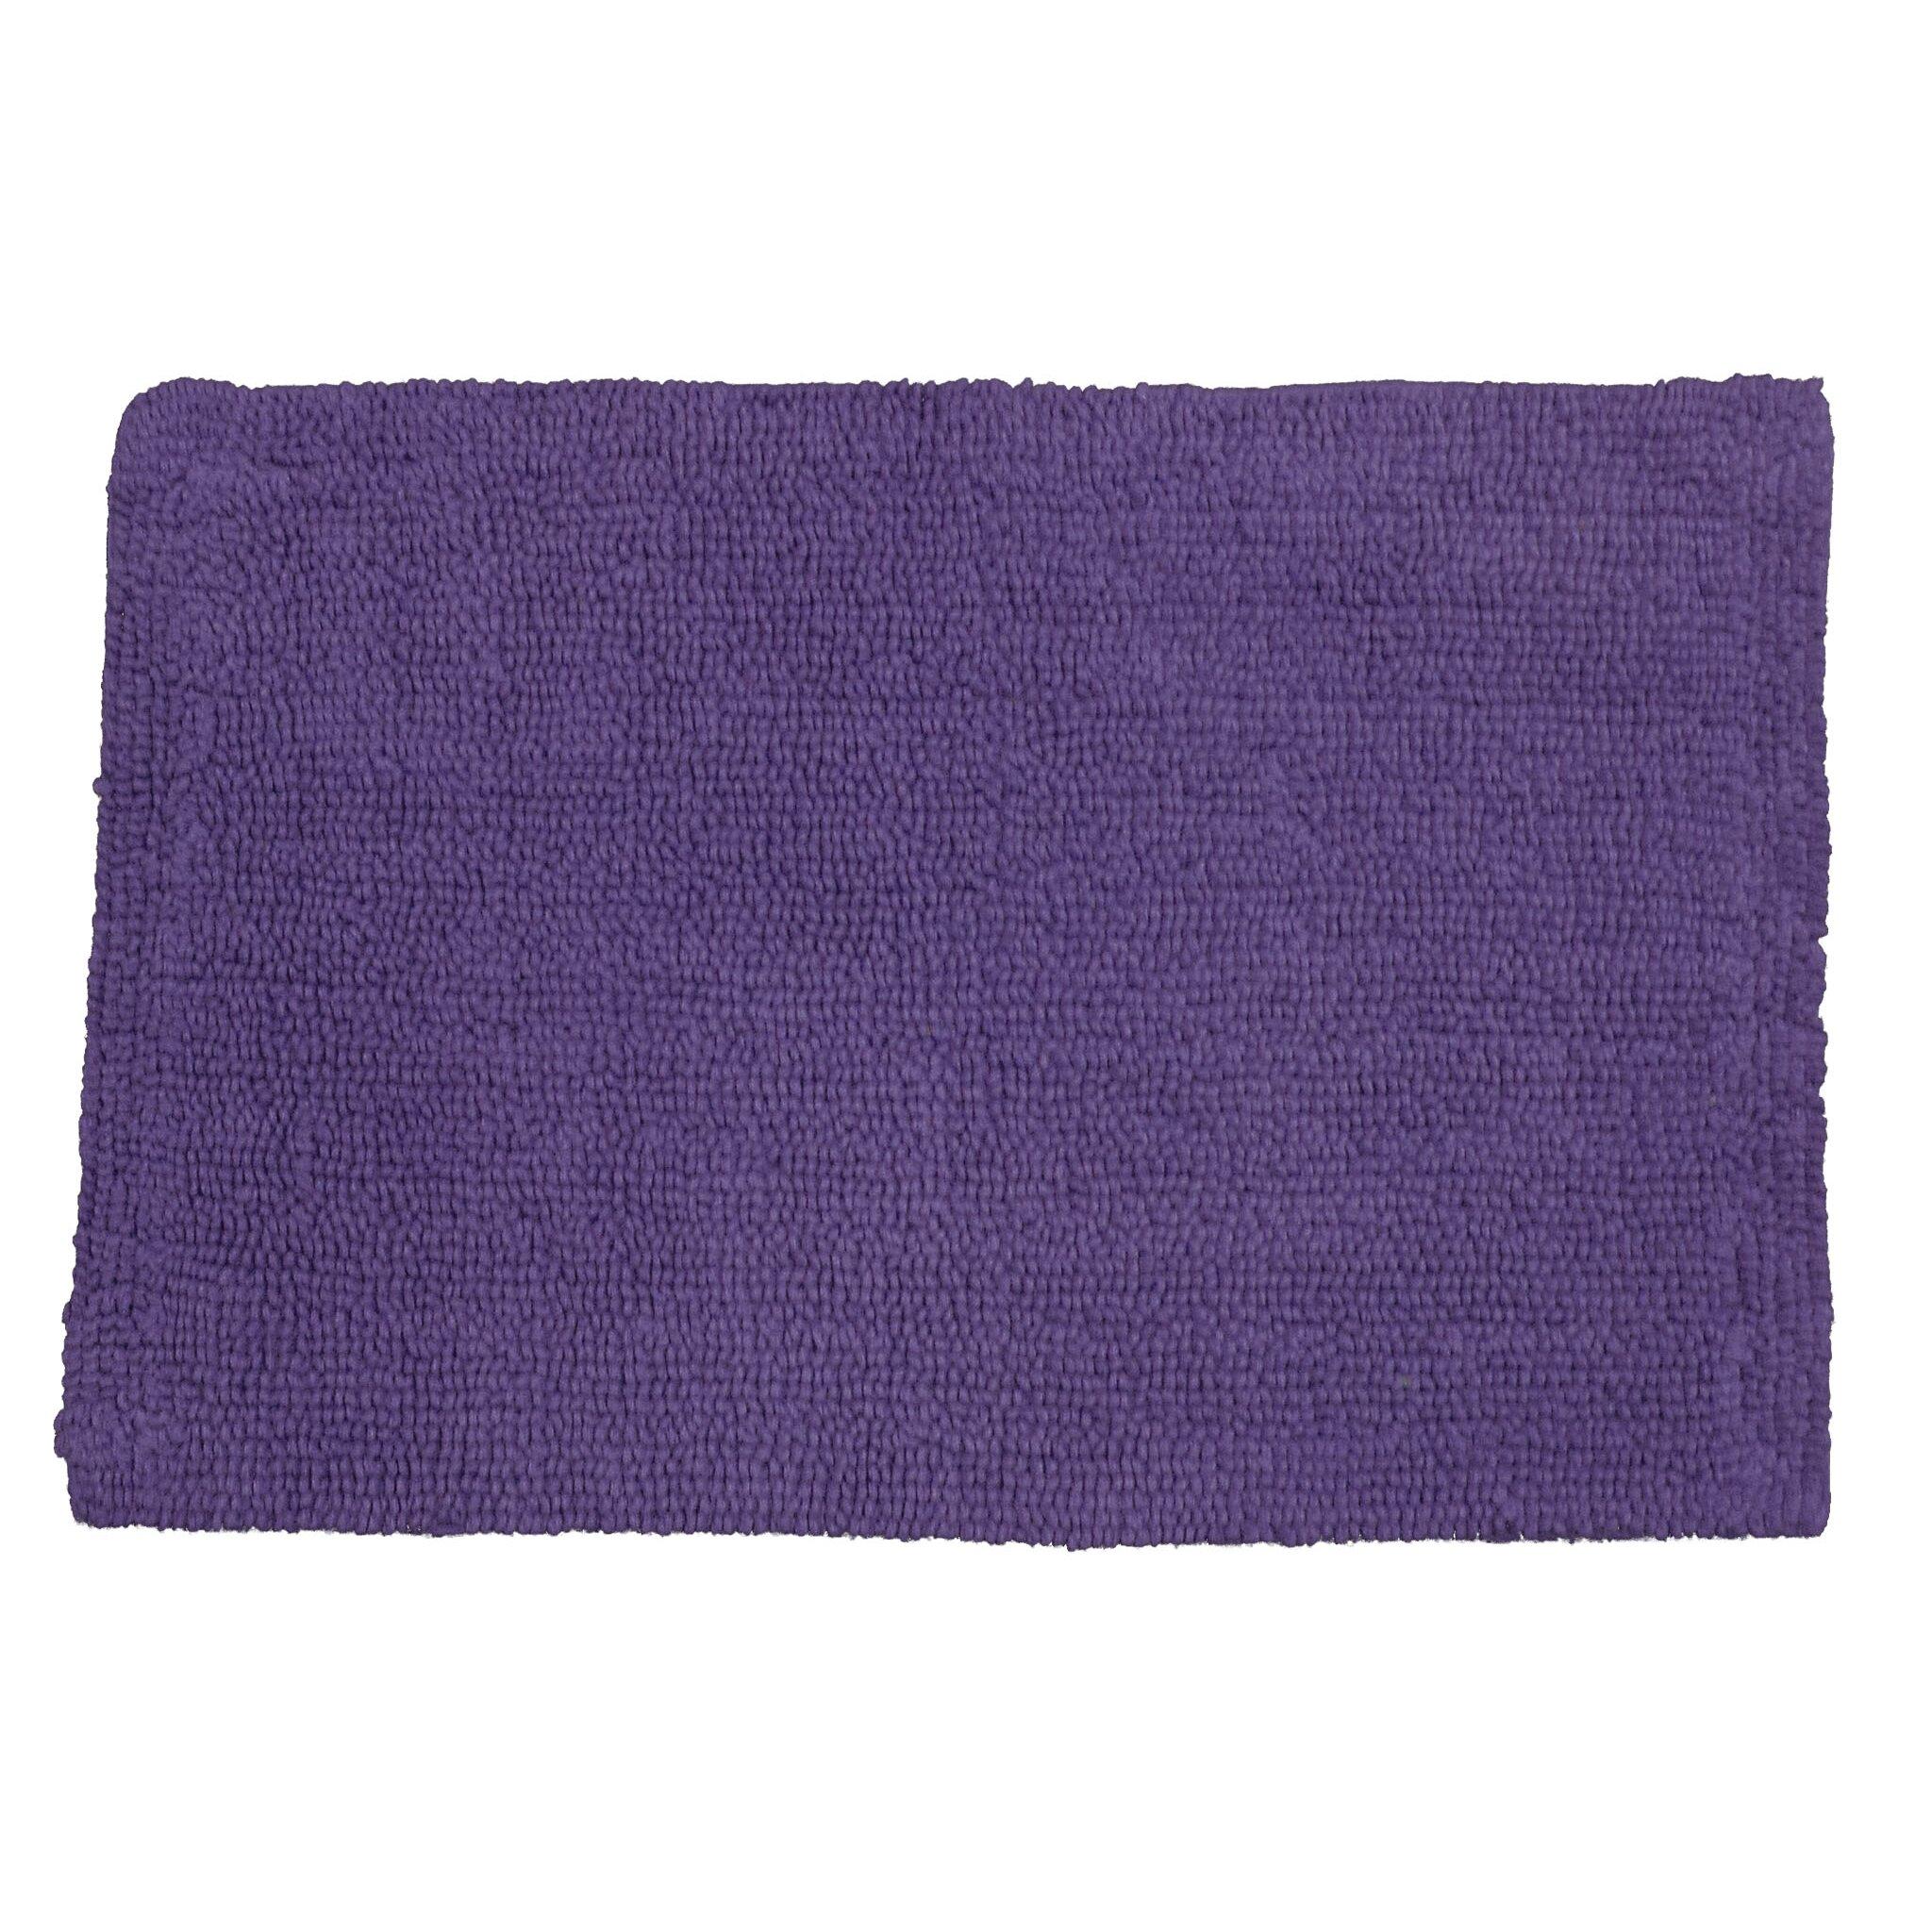 Janey lynn 39 s designs inc giggly grape area rug reviews wayfair - Grape design kitchen rugs ...